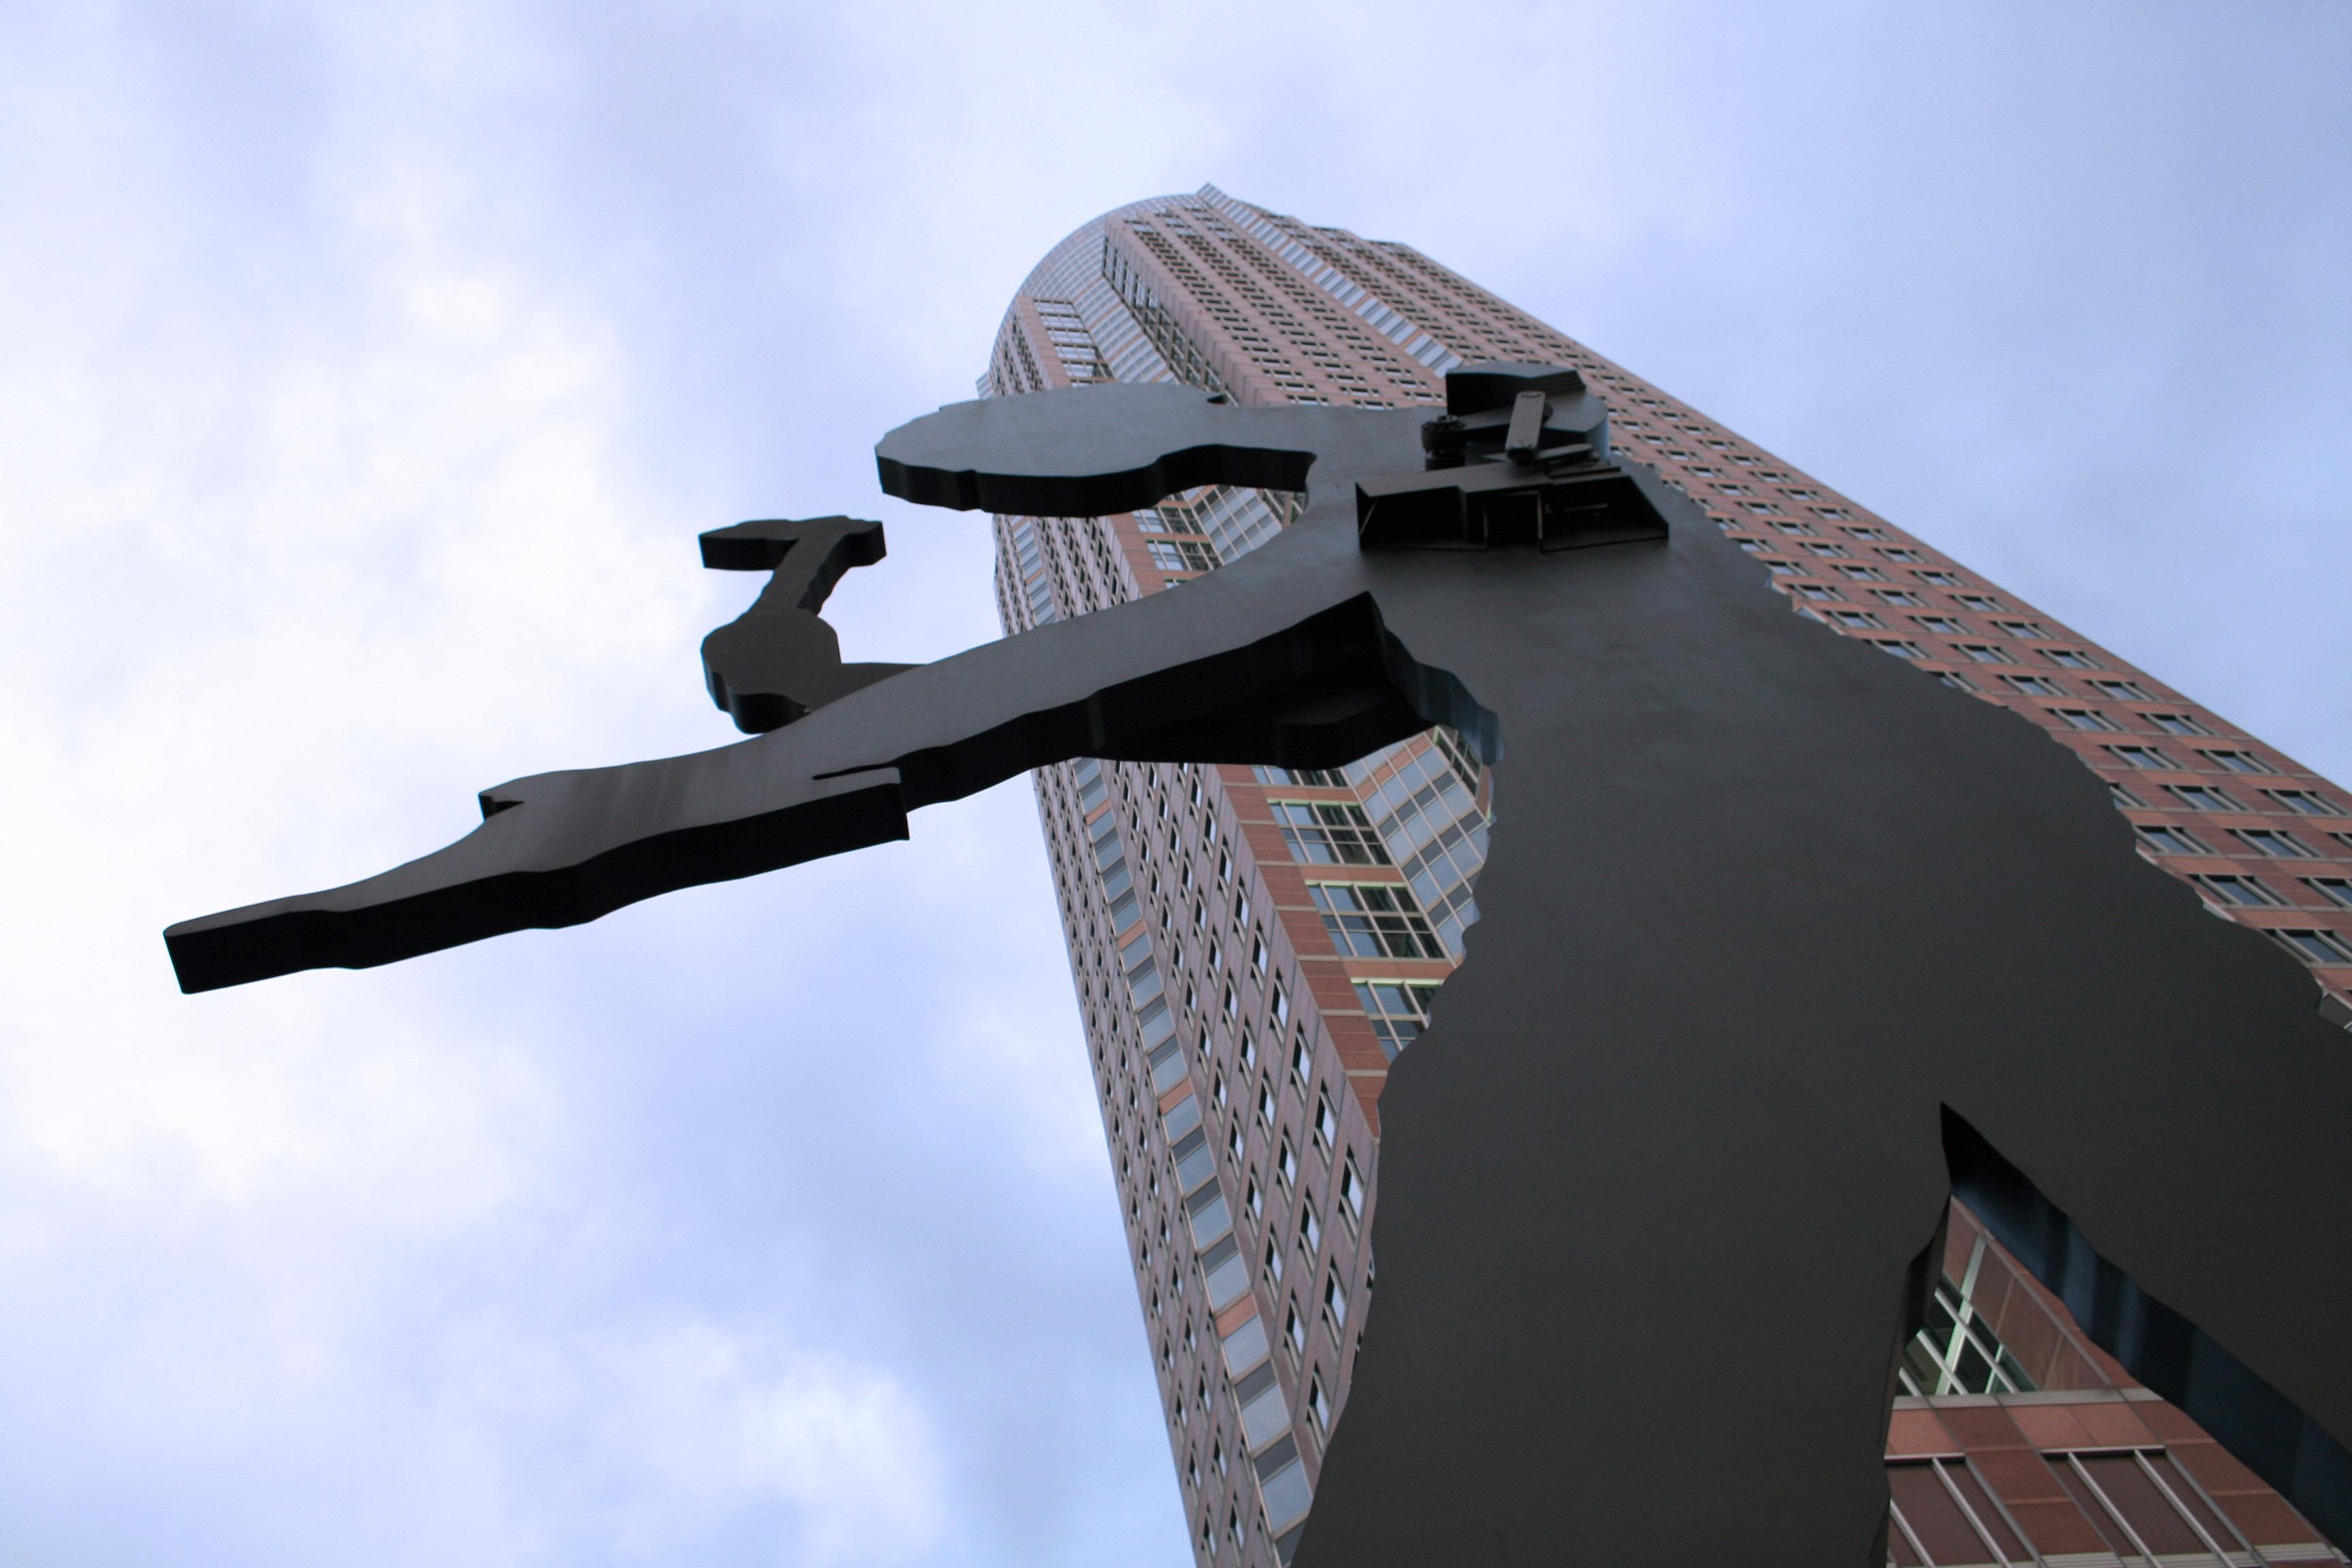 https://i1.wp.com/upload.wikimedia.org/wikipedia/commons/f/f4/Hammering_Man_vor_Messeturm.jpg